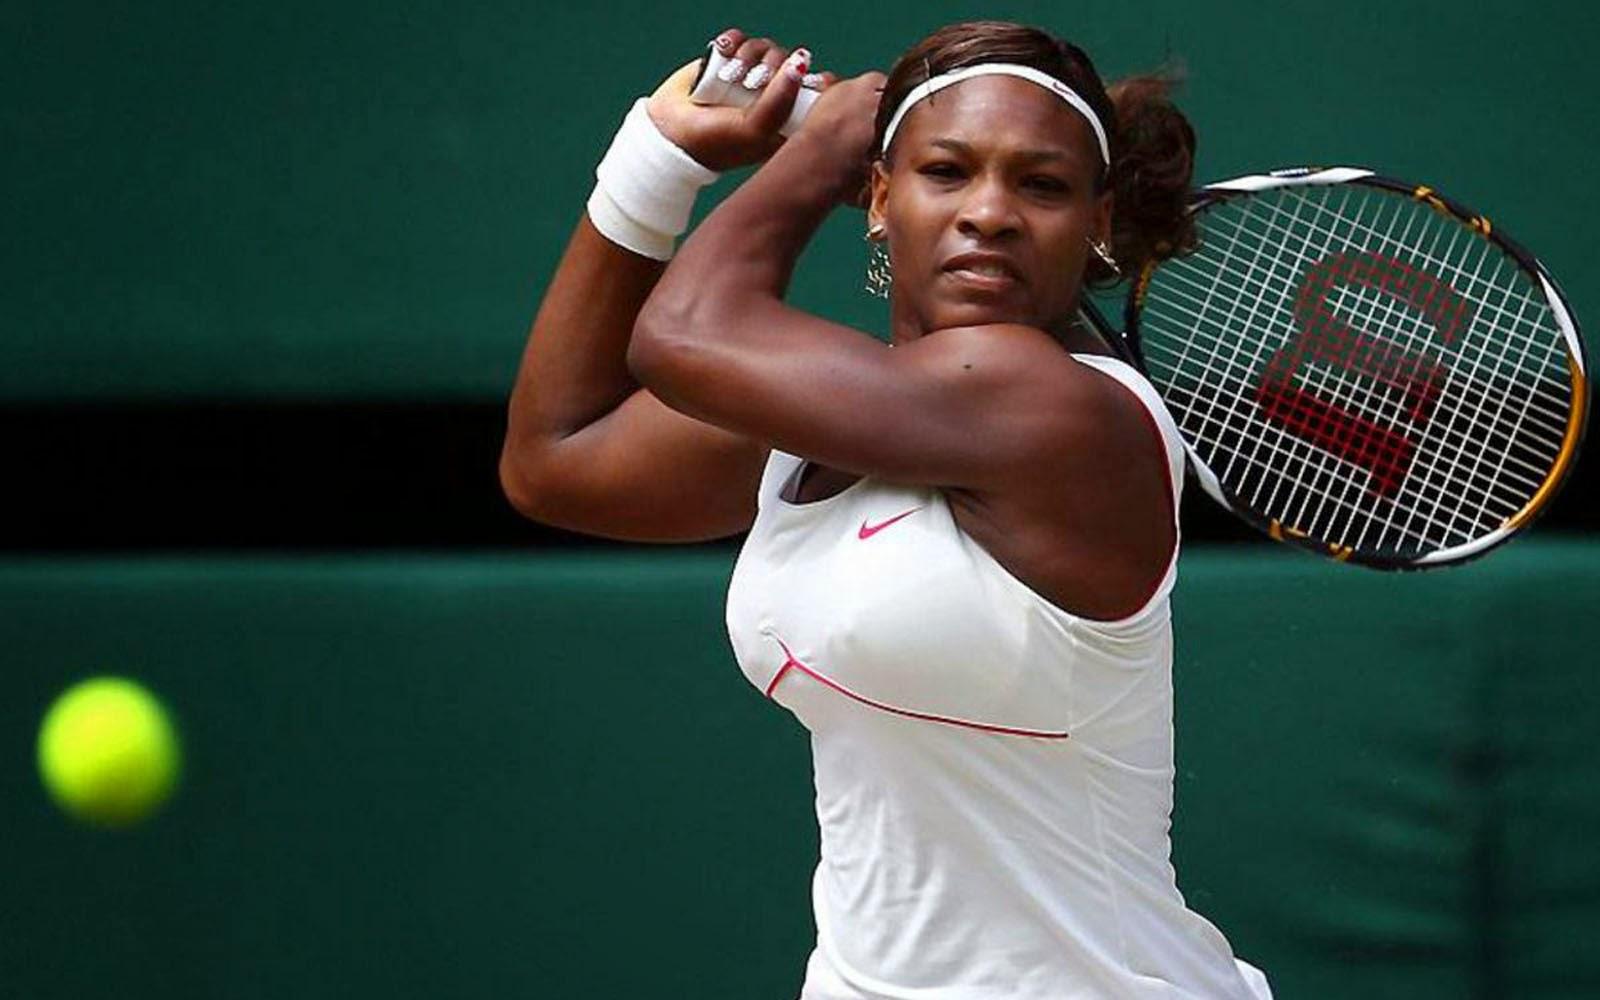 Serena Williams Wallpaper   Serena Williams Wallpaper 41815959 1600x1000